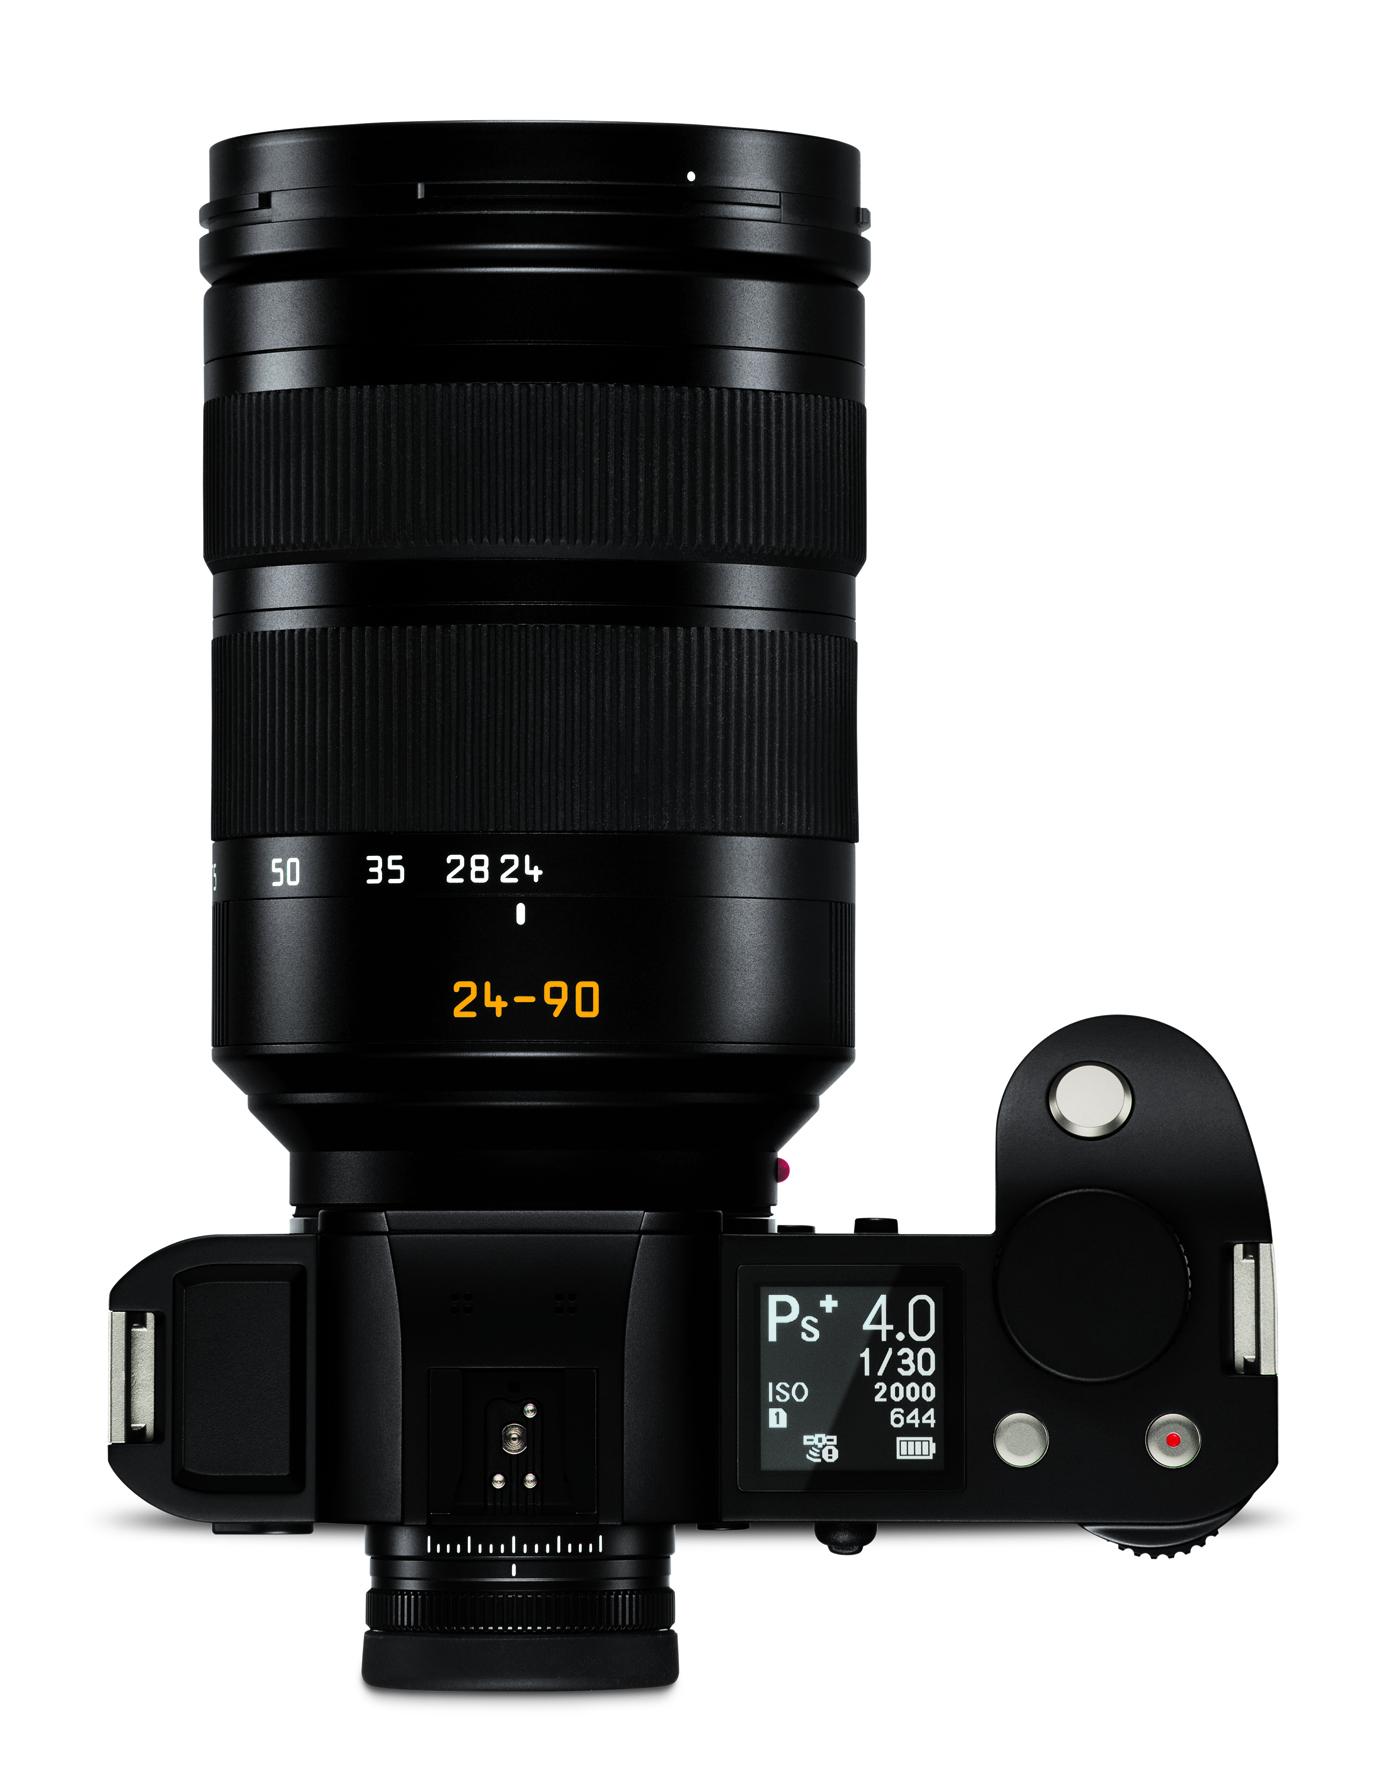 photo gear pare down - Leica SL pro photo - courtesy of Leica